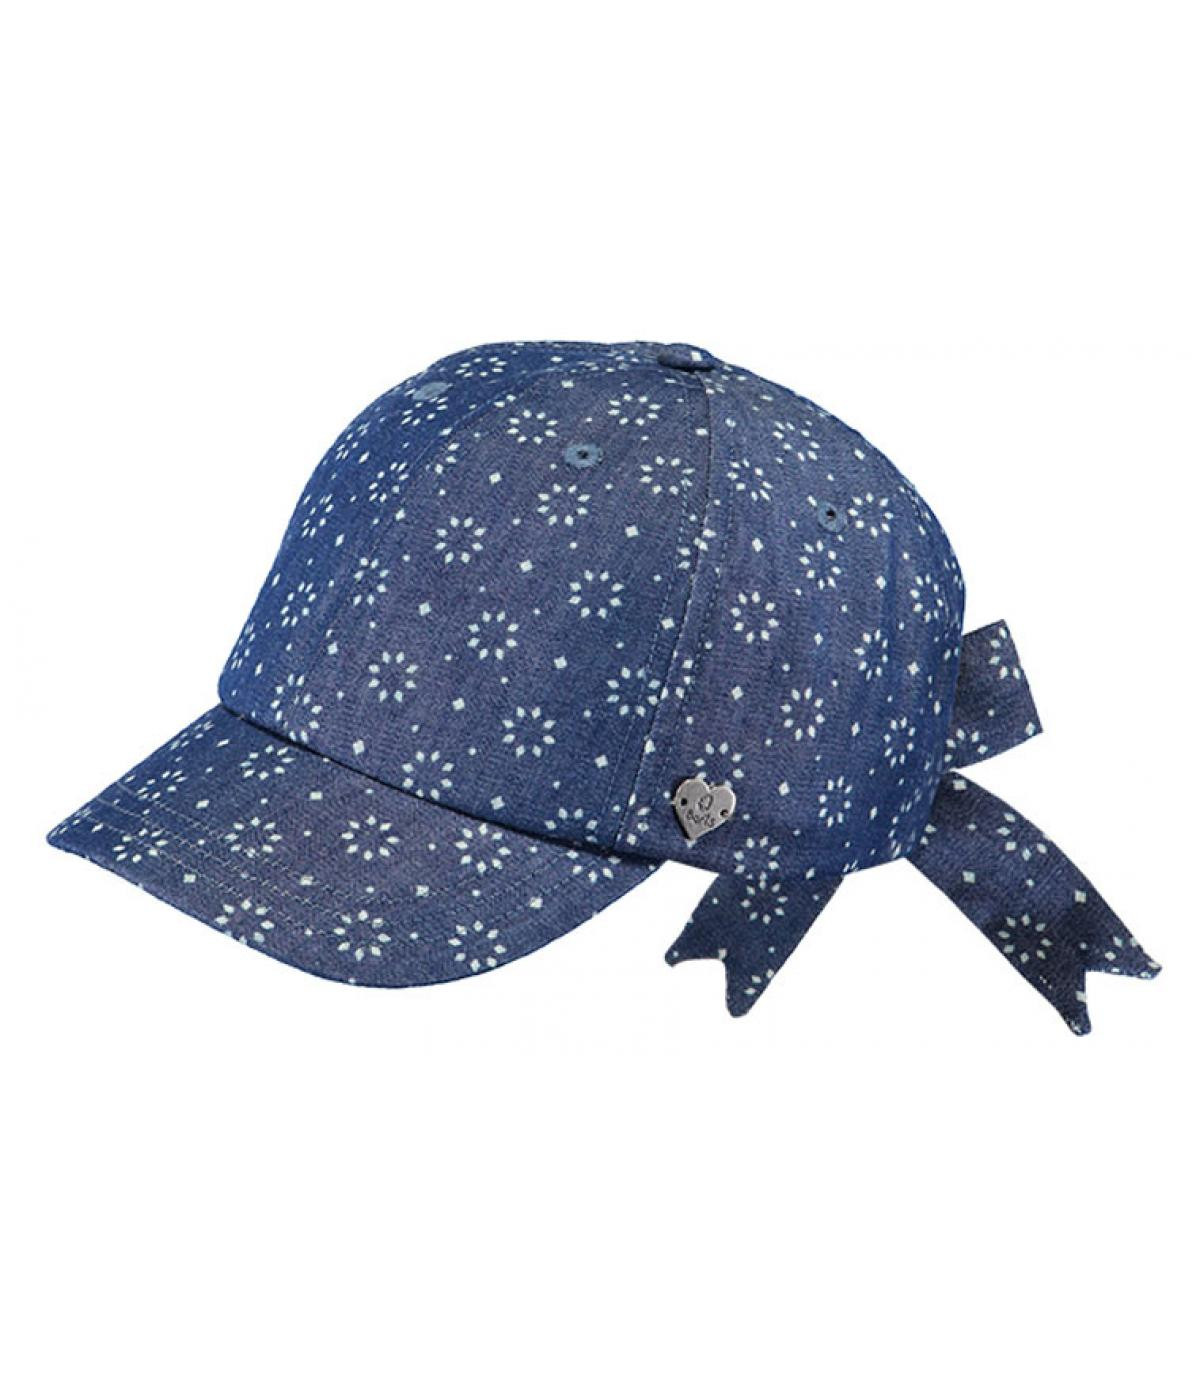 Kinder Cap blau Schleife